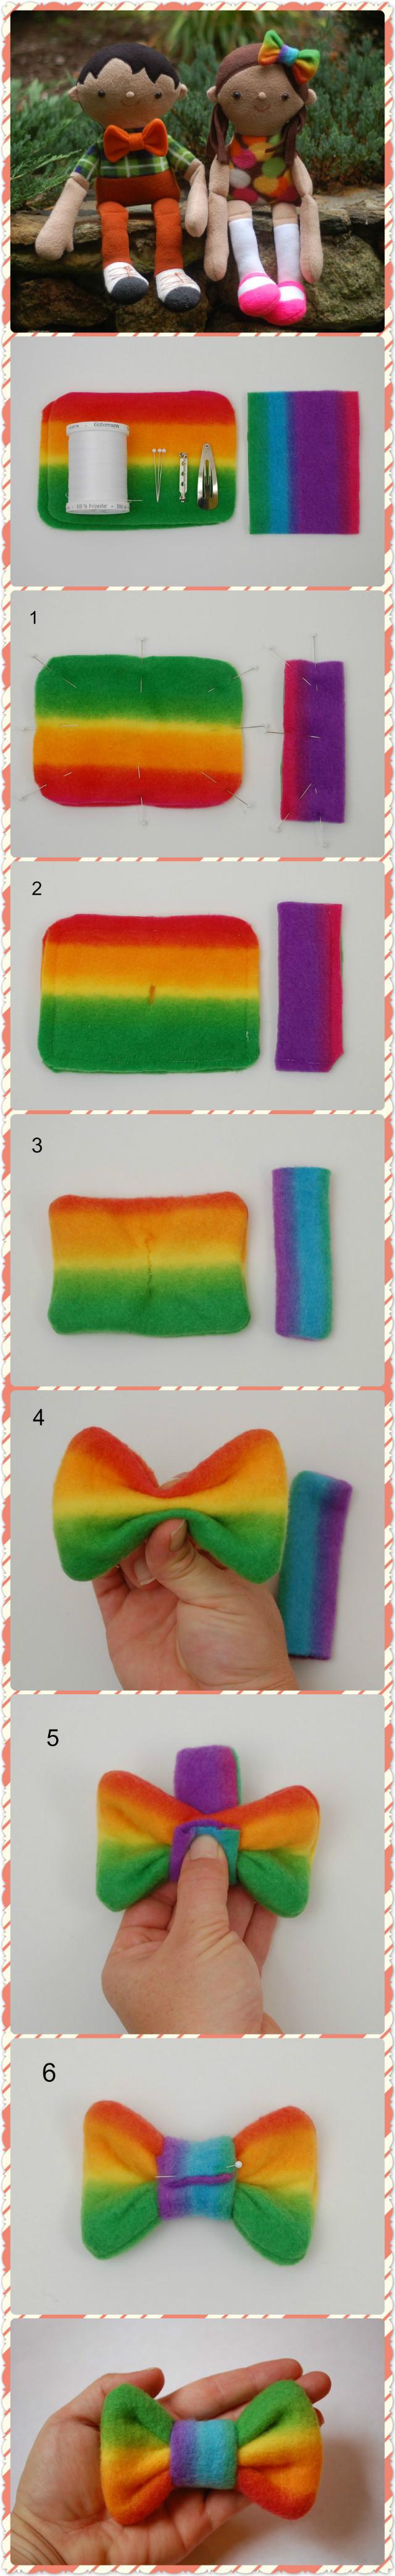 How to Make a Fleece Bow Tie.. Click www.welikecraft.com for more craft ideas!